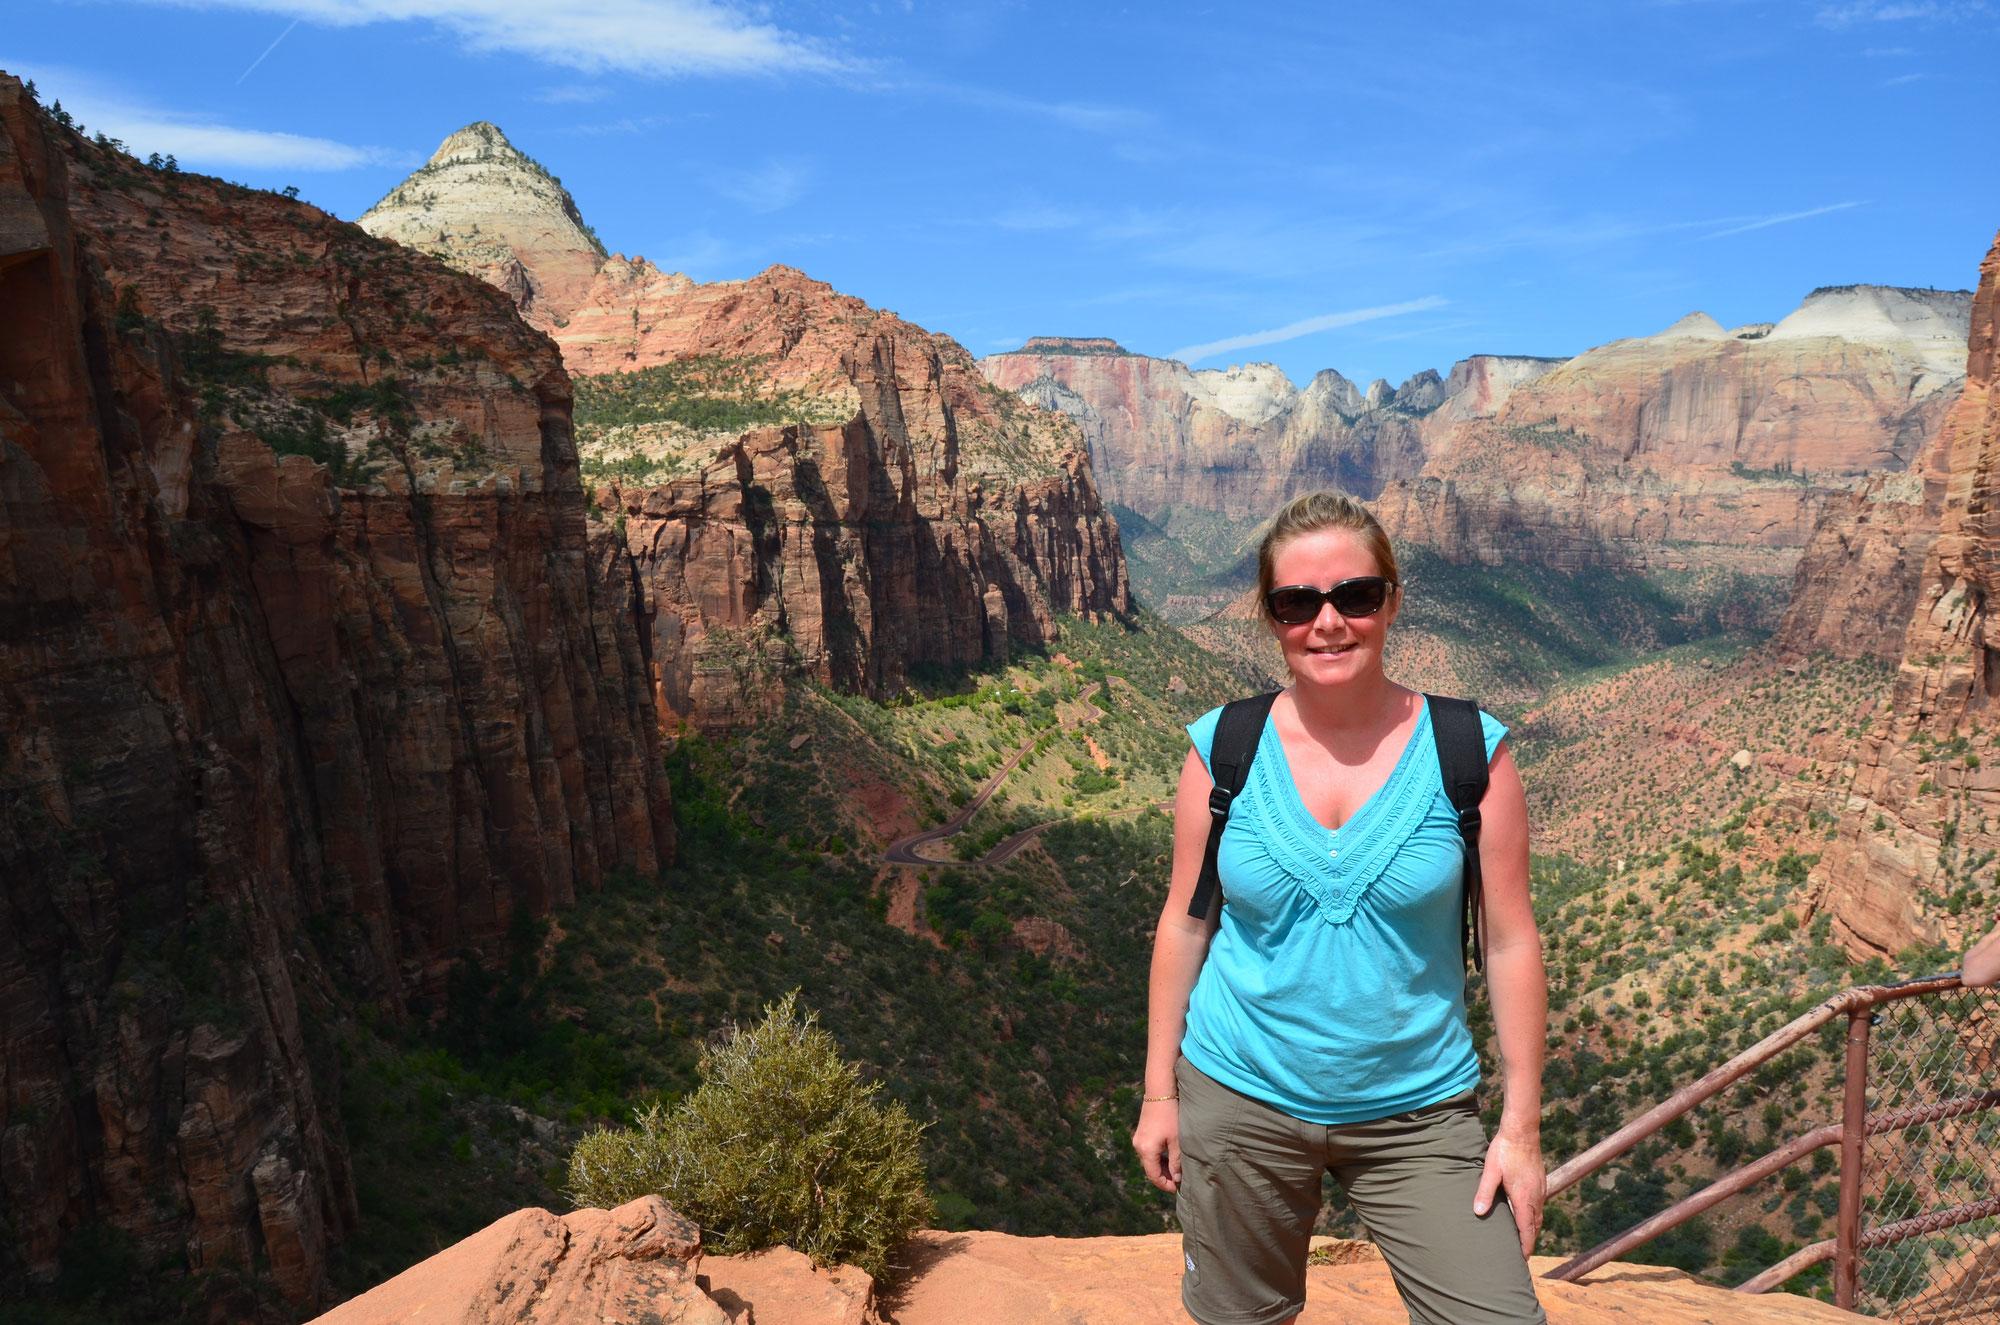 ROAD TRIP USA #1 - Zion National Park